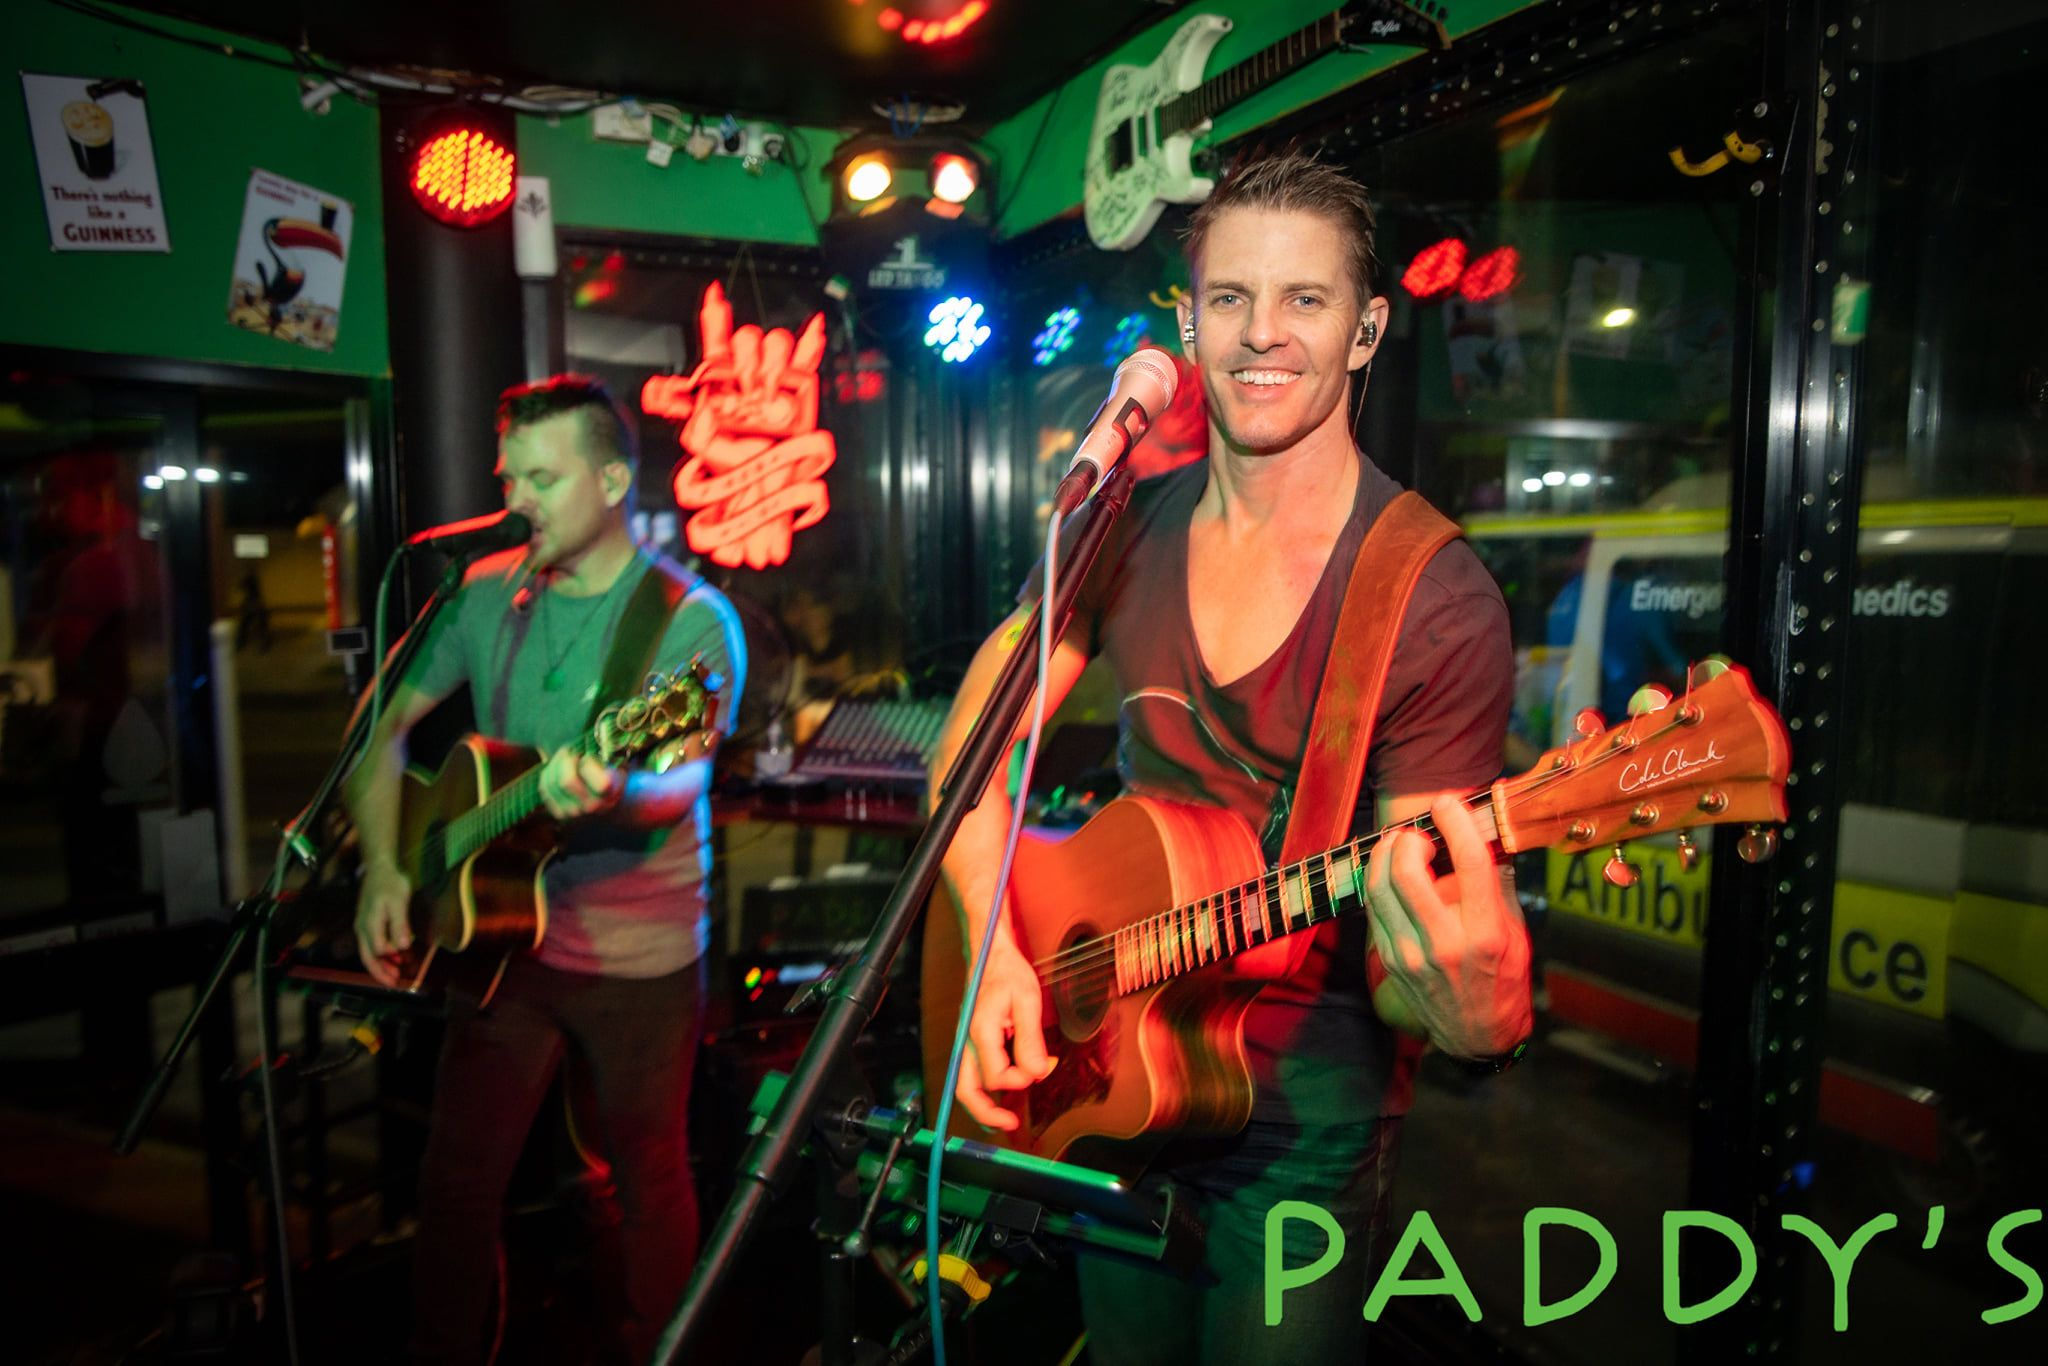 Airlie Beach Nightlife Paddy's Shenanigans Irish Pub Live music